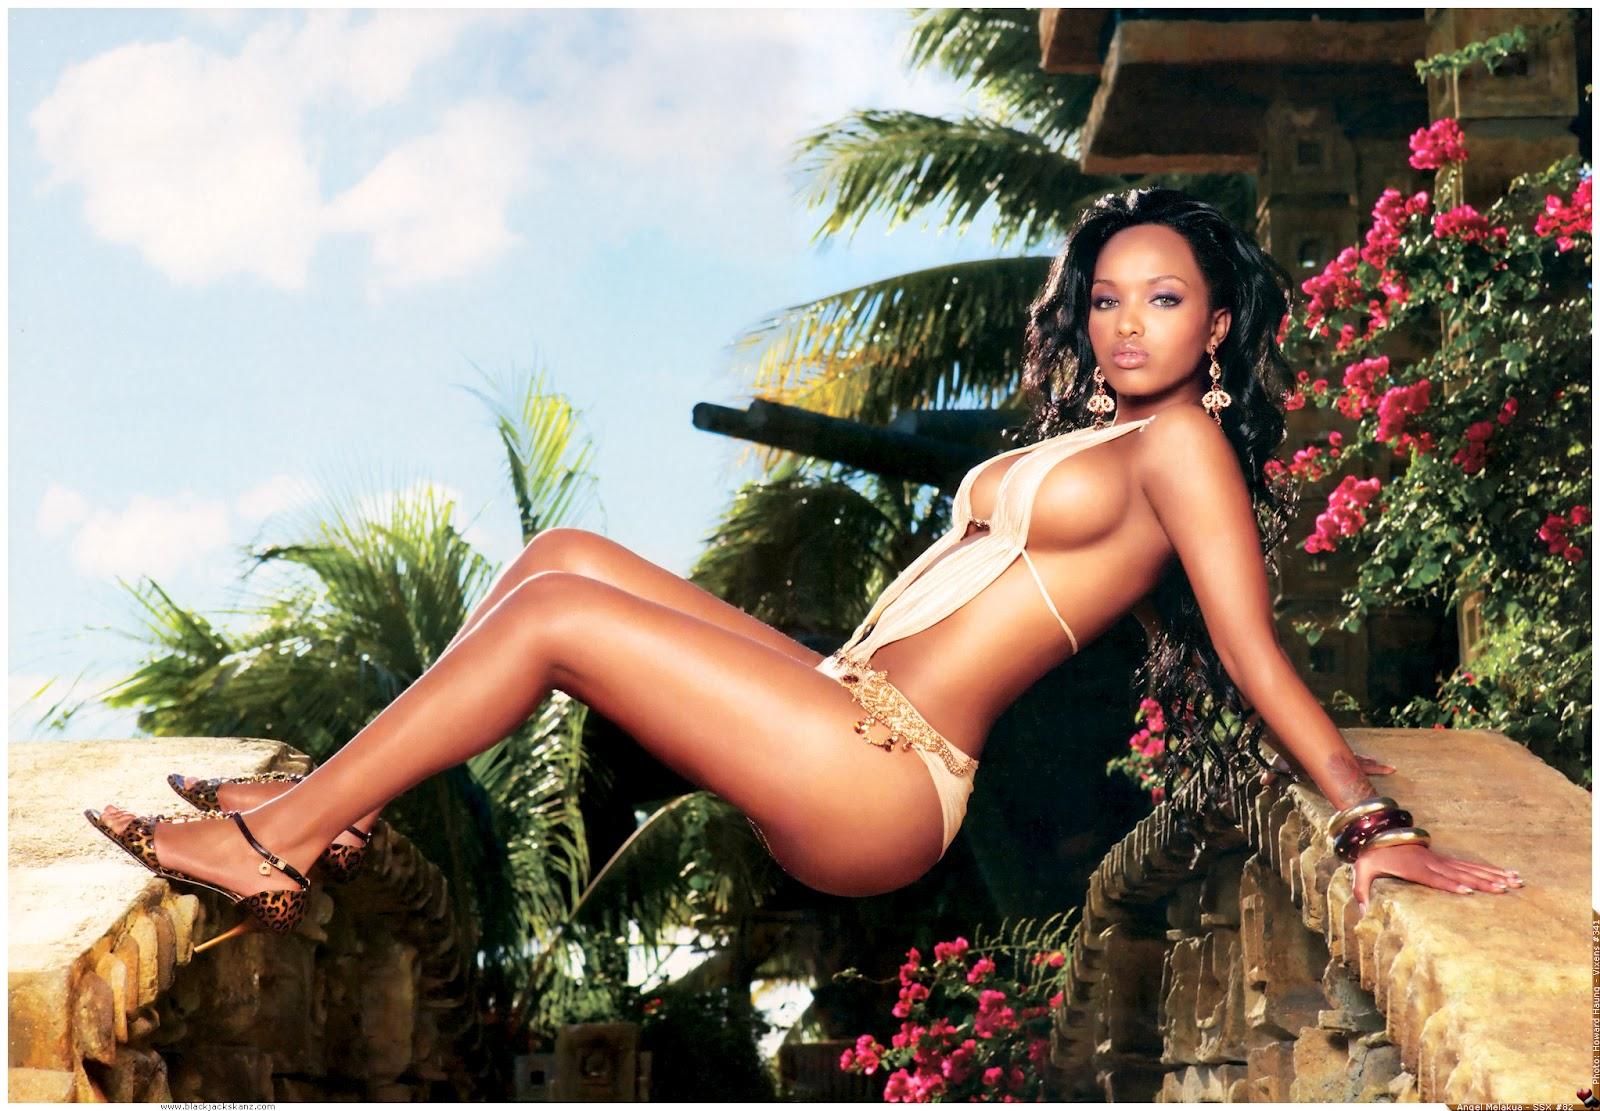 Фото африканок без купальников, Африканка загорает на шезлонге без бикини 3 фотография